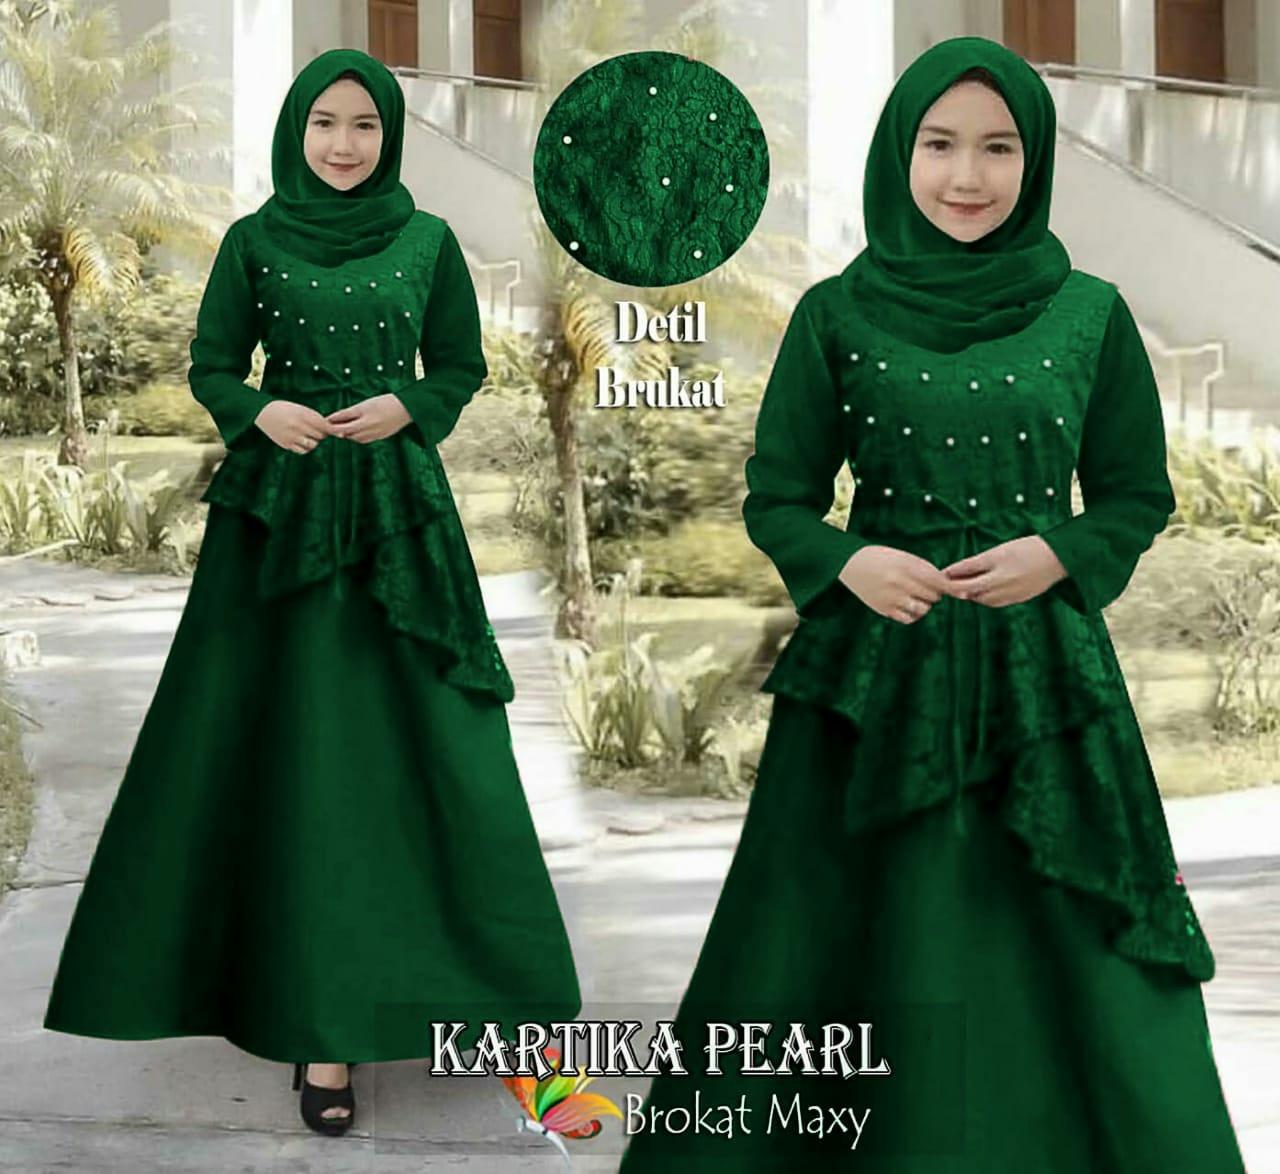 mj fashion wanita dress / maxy / gamis wanita kartika green furring – brokat